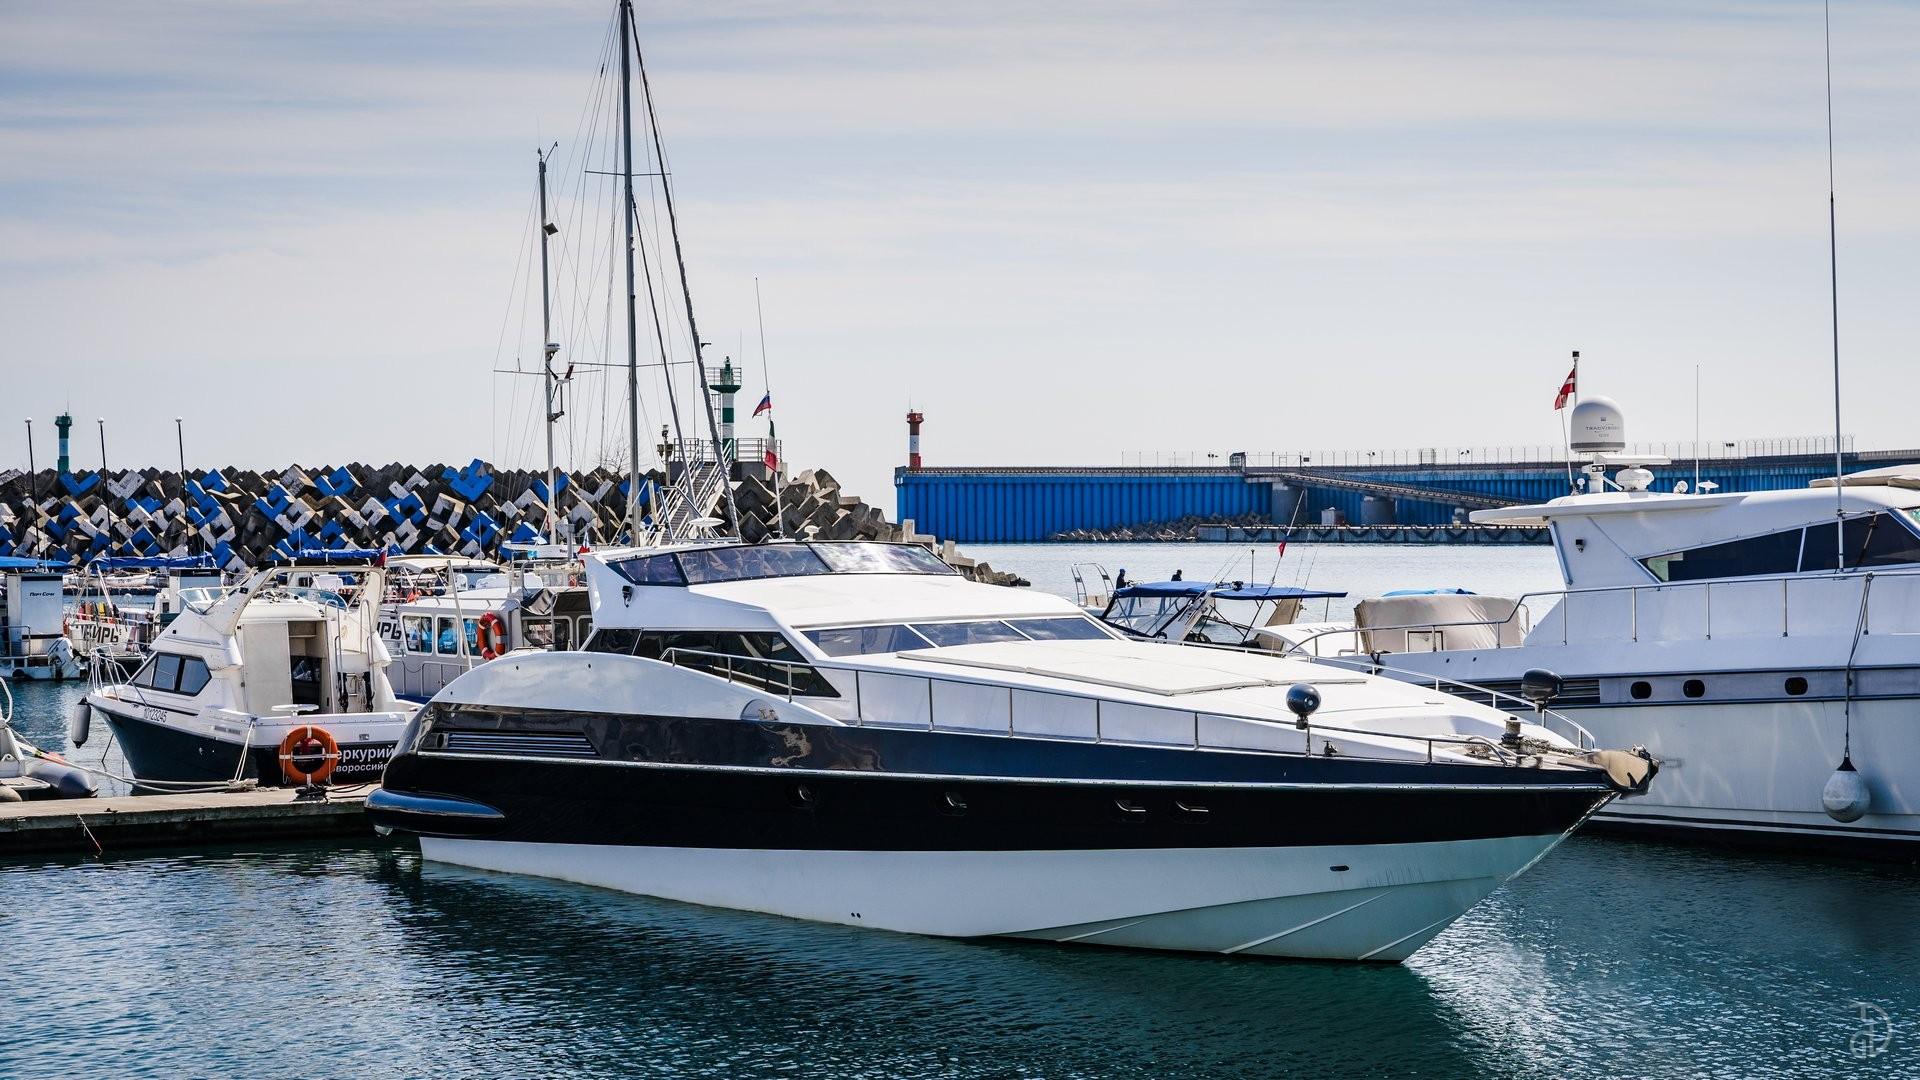 Аренда моторной яхты Sanlorenzo. Фото 1